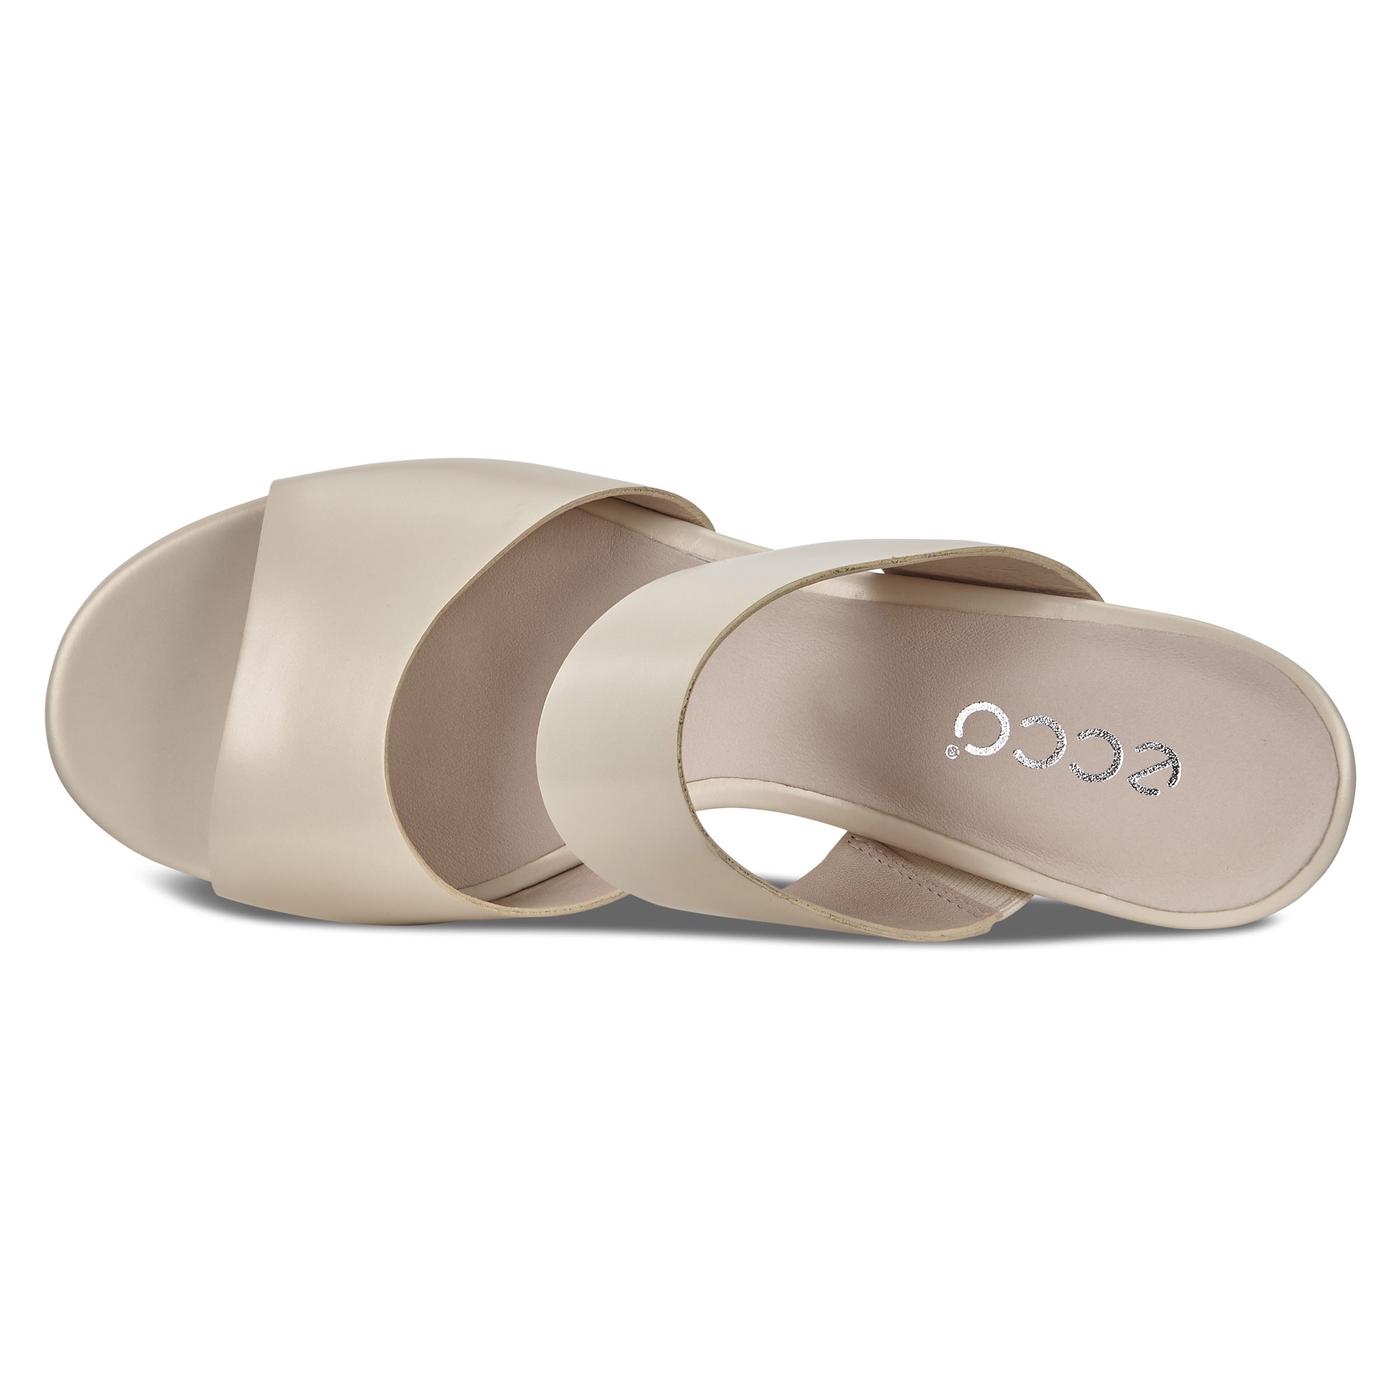 ECCO SHAPE SLEEK SANDAL Mule 45mm